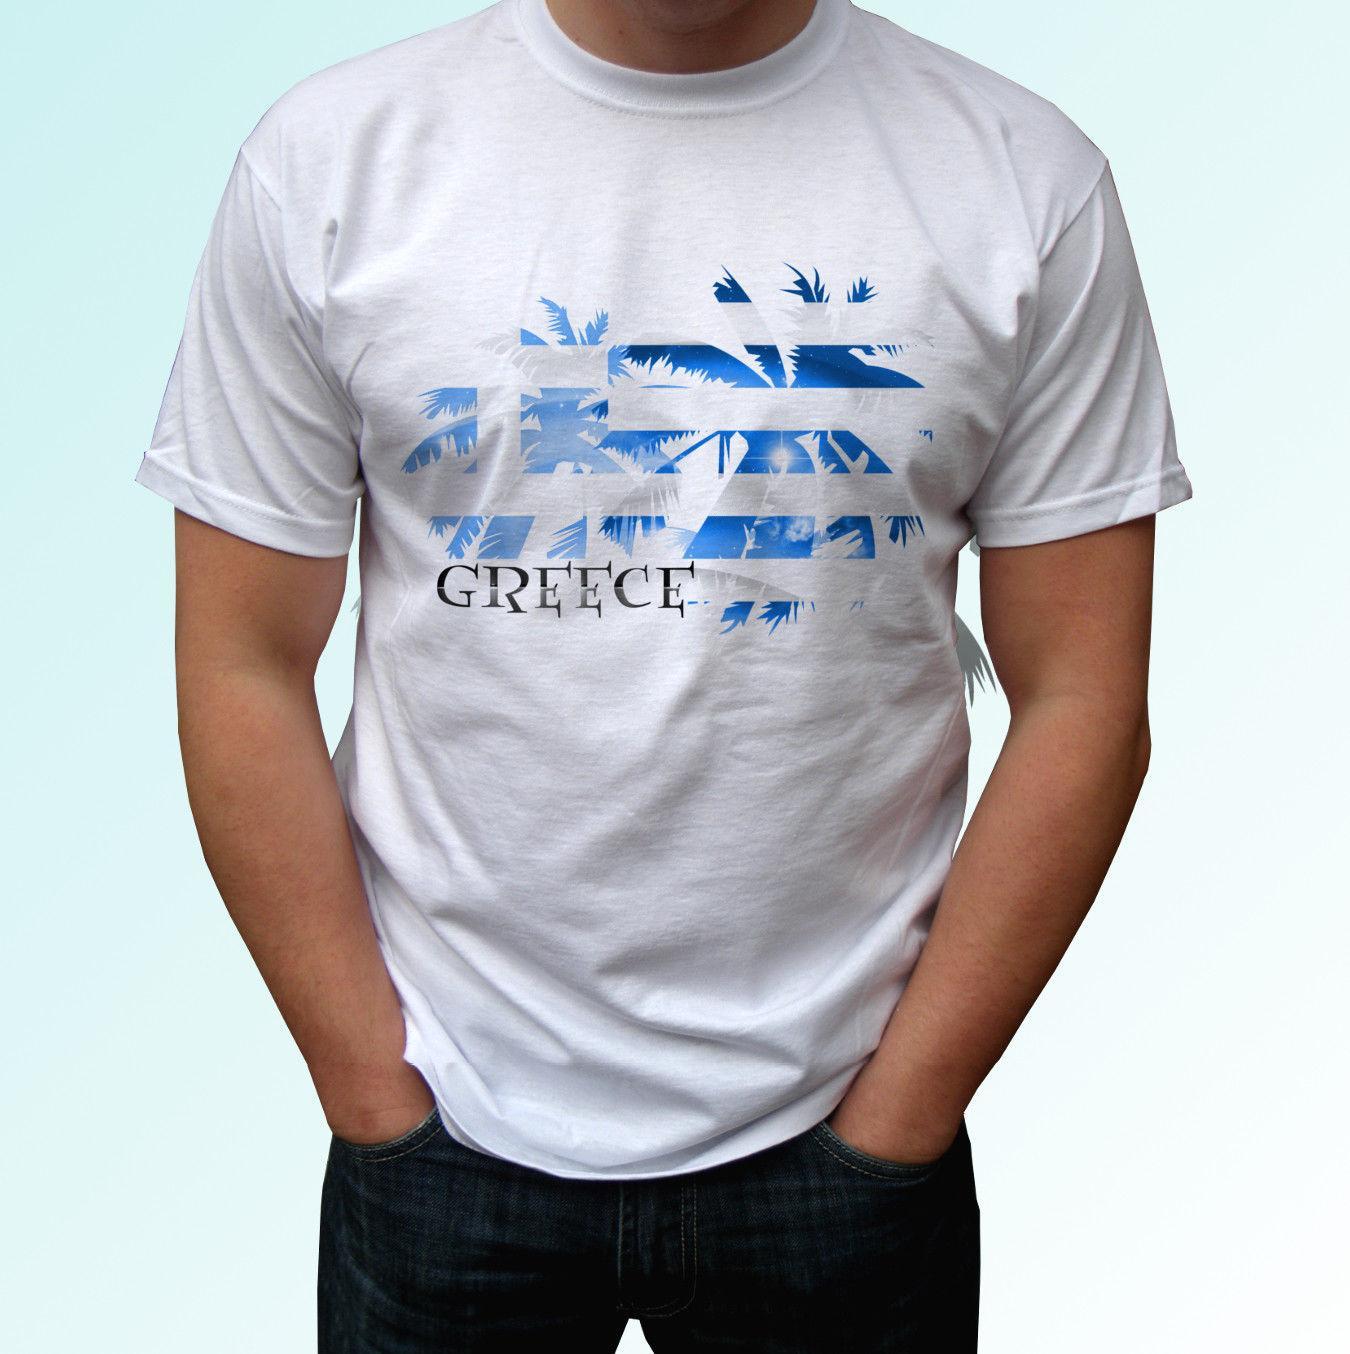 Greece Football Mascot T-Shirt *Choice Of MENS LADIES KIDS* Fan Shirt